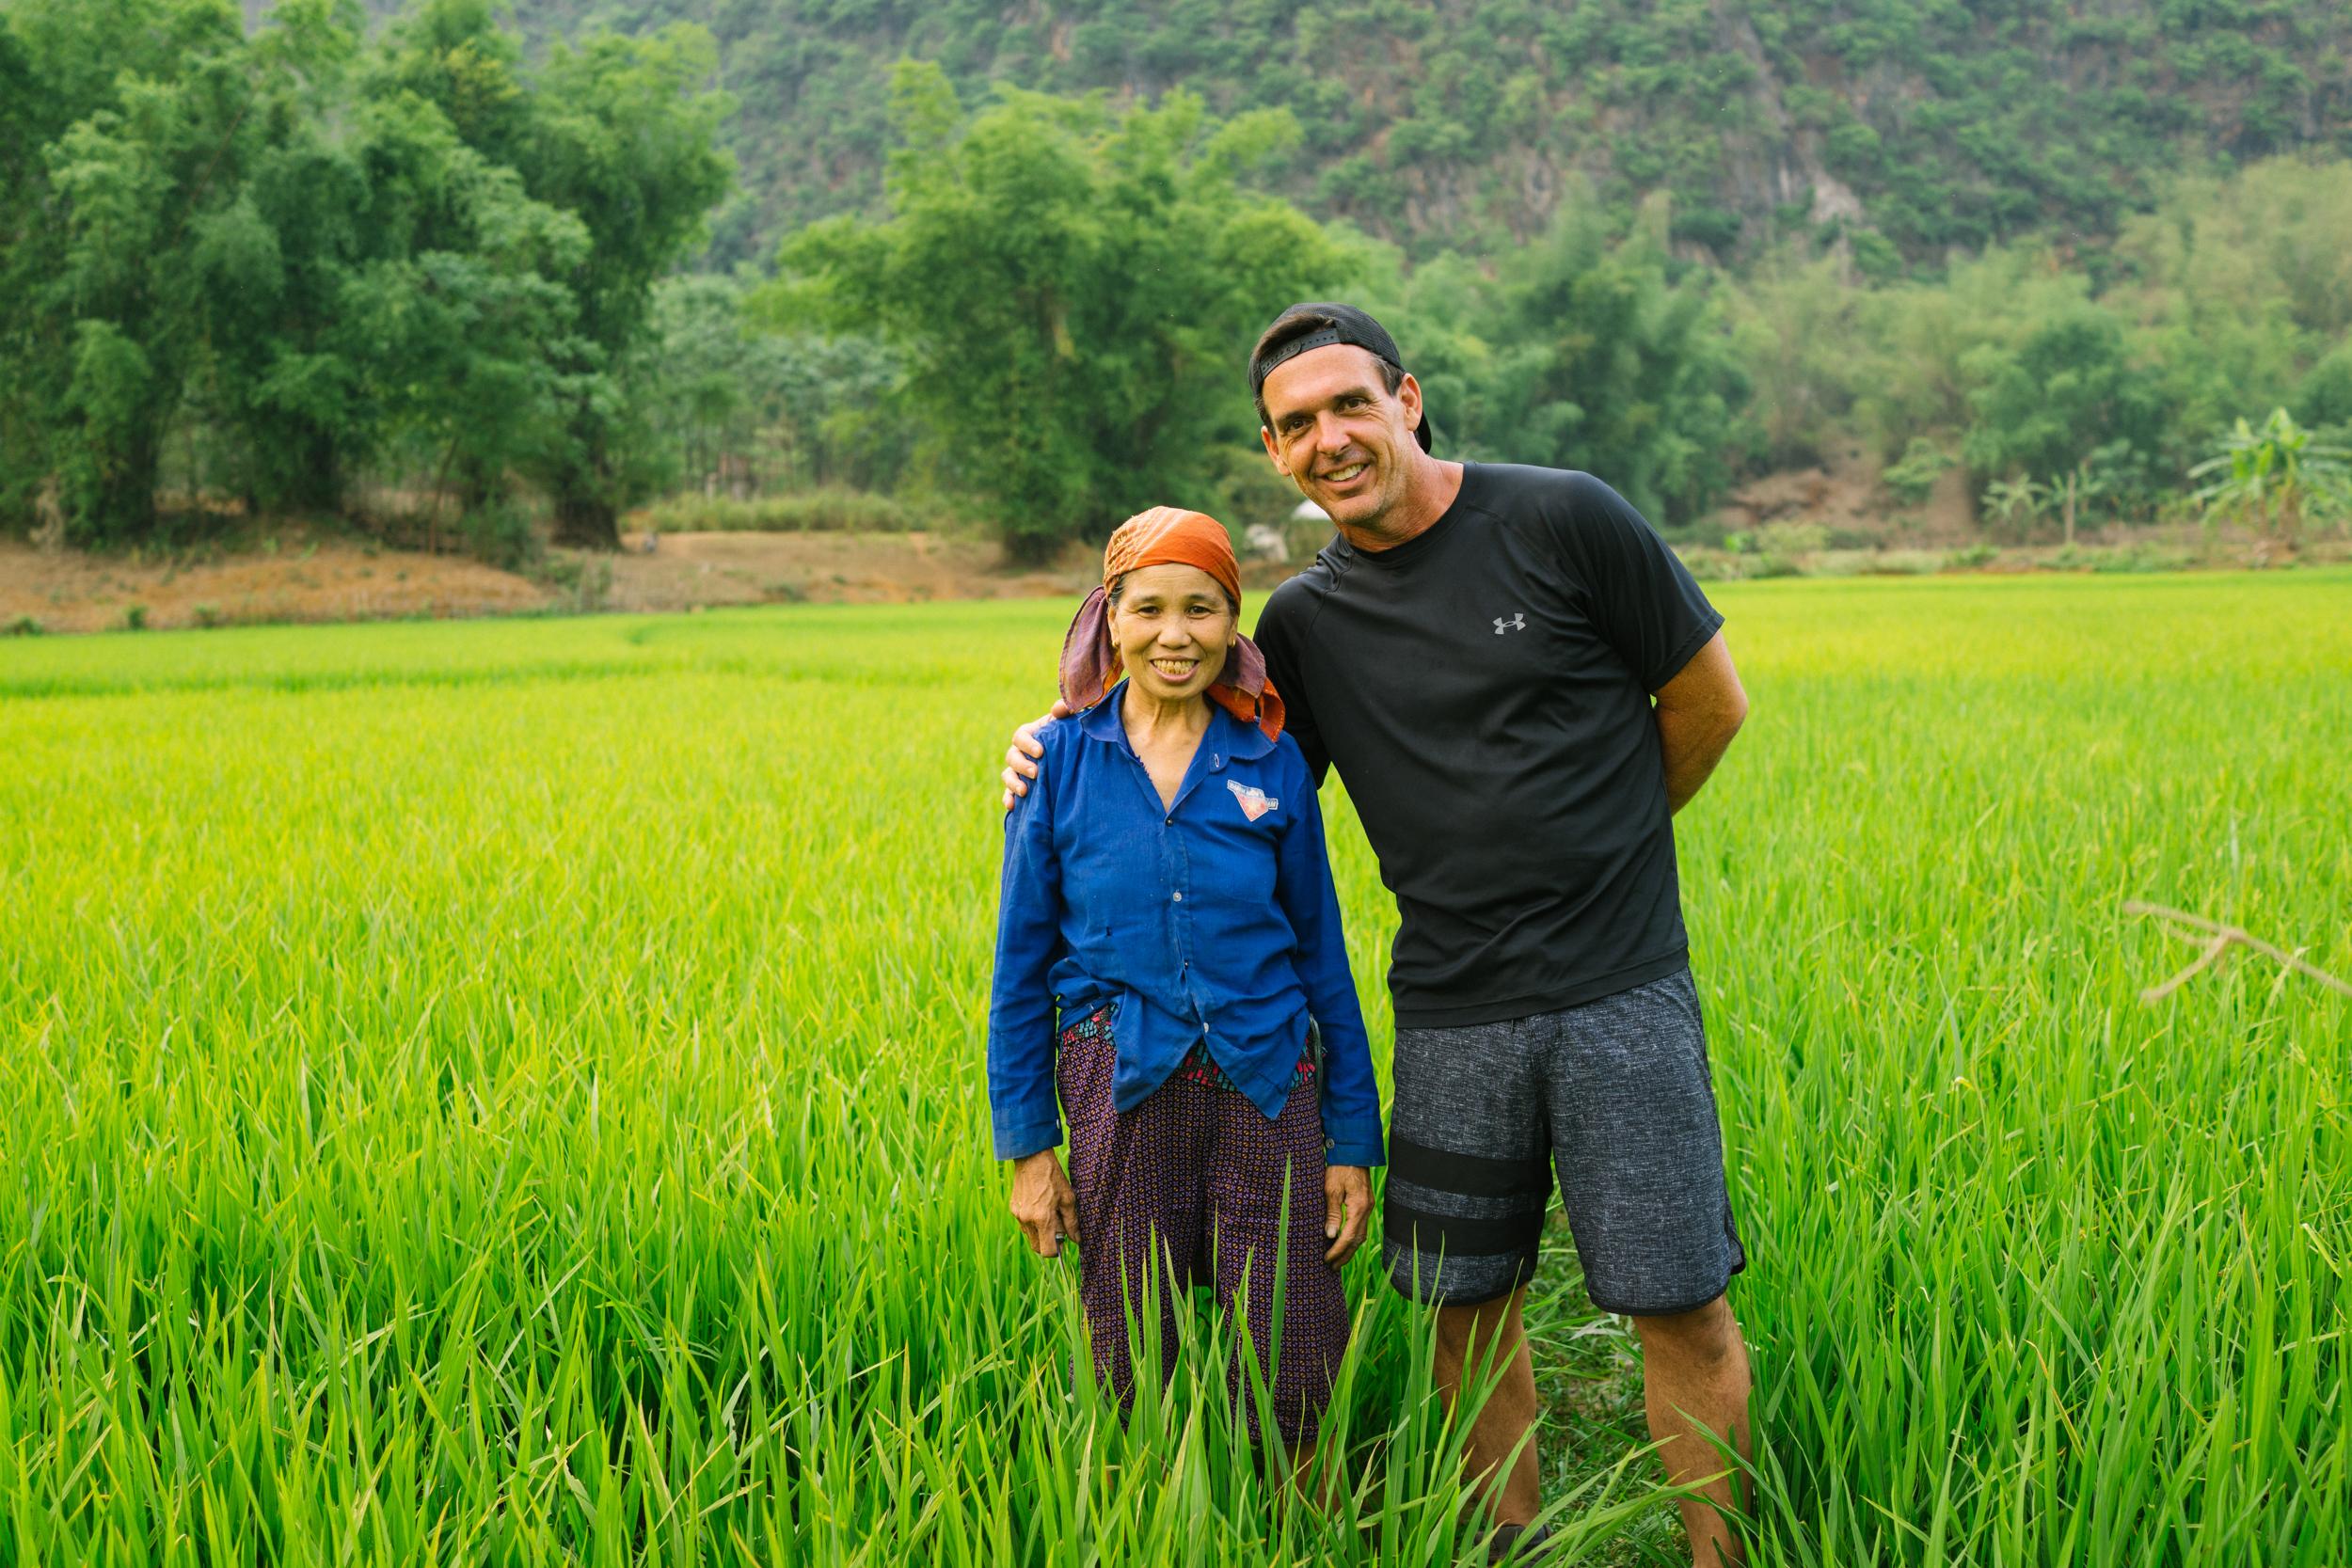 vietnam-project-apr-2015_0124.jpg